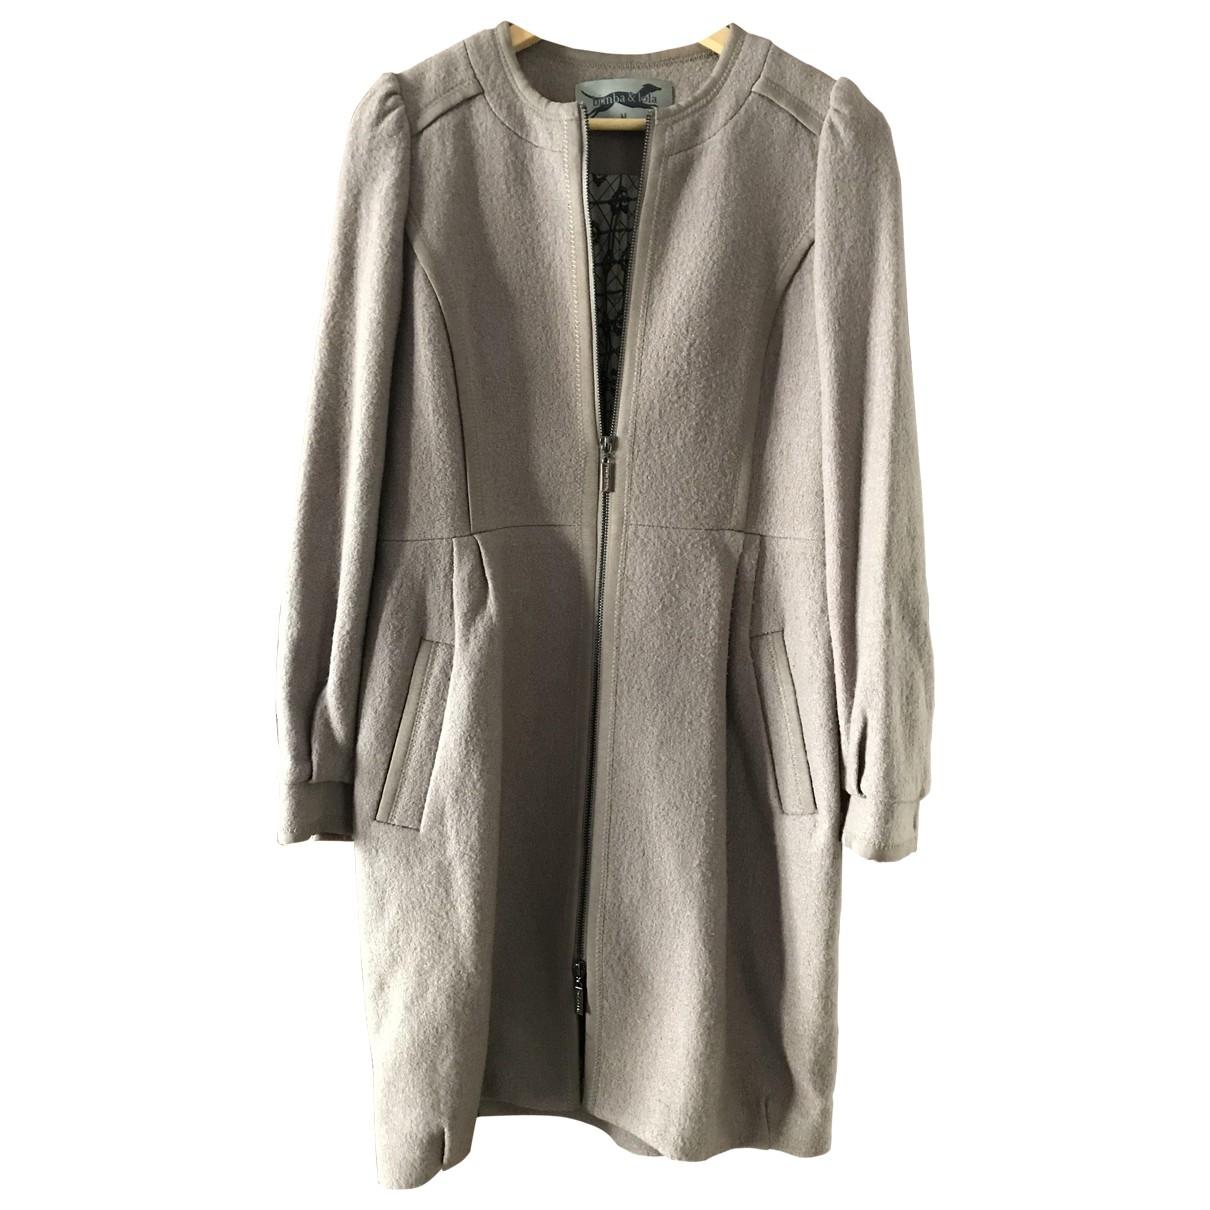 Bimba Y Lola \N Grey Wool coat for Women M International